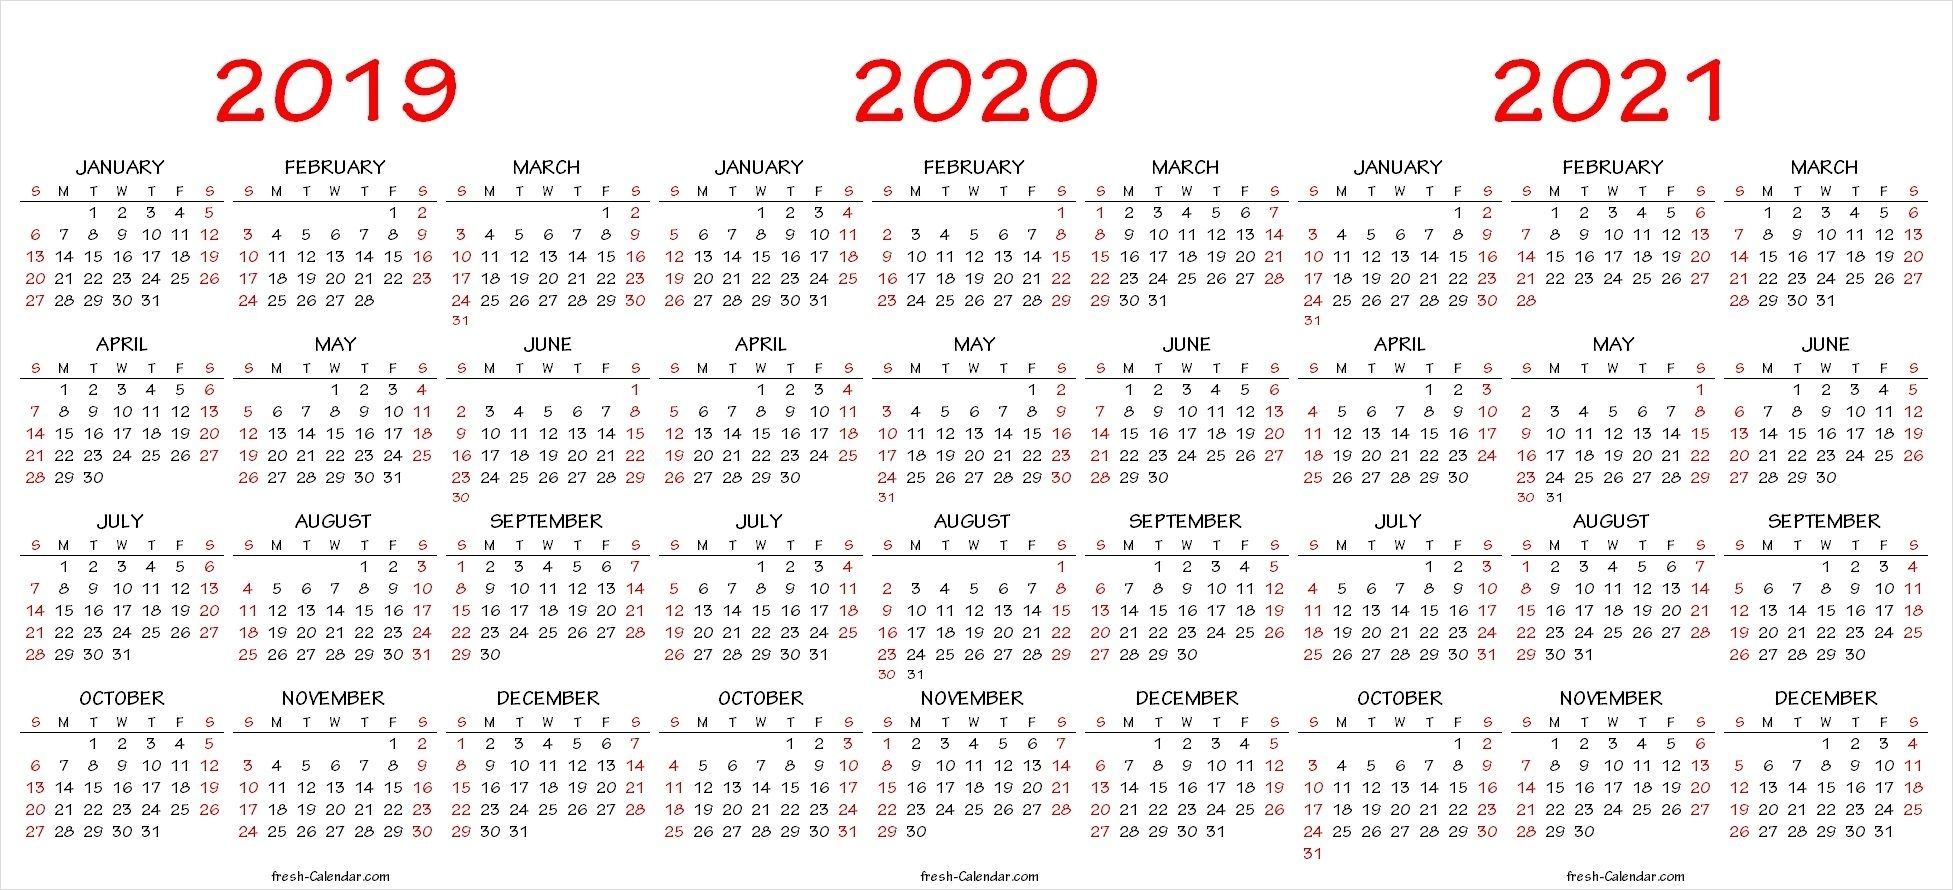 2019 2020 2021 Calendar Pdf Template | 2021 Calendar, Yearly pertaining to 2019 2020 2021 Printable Calendar